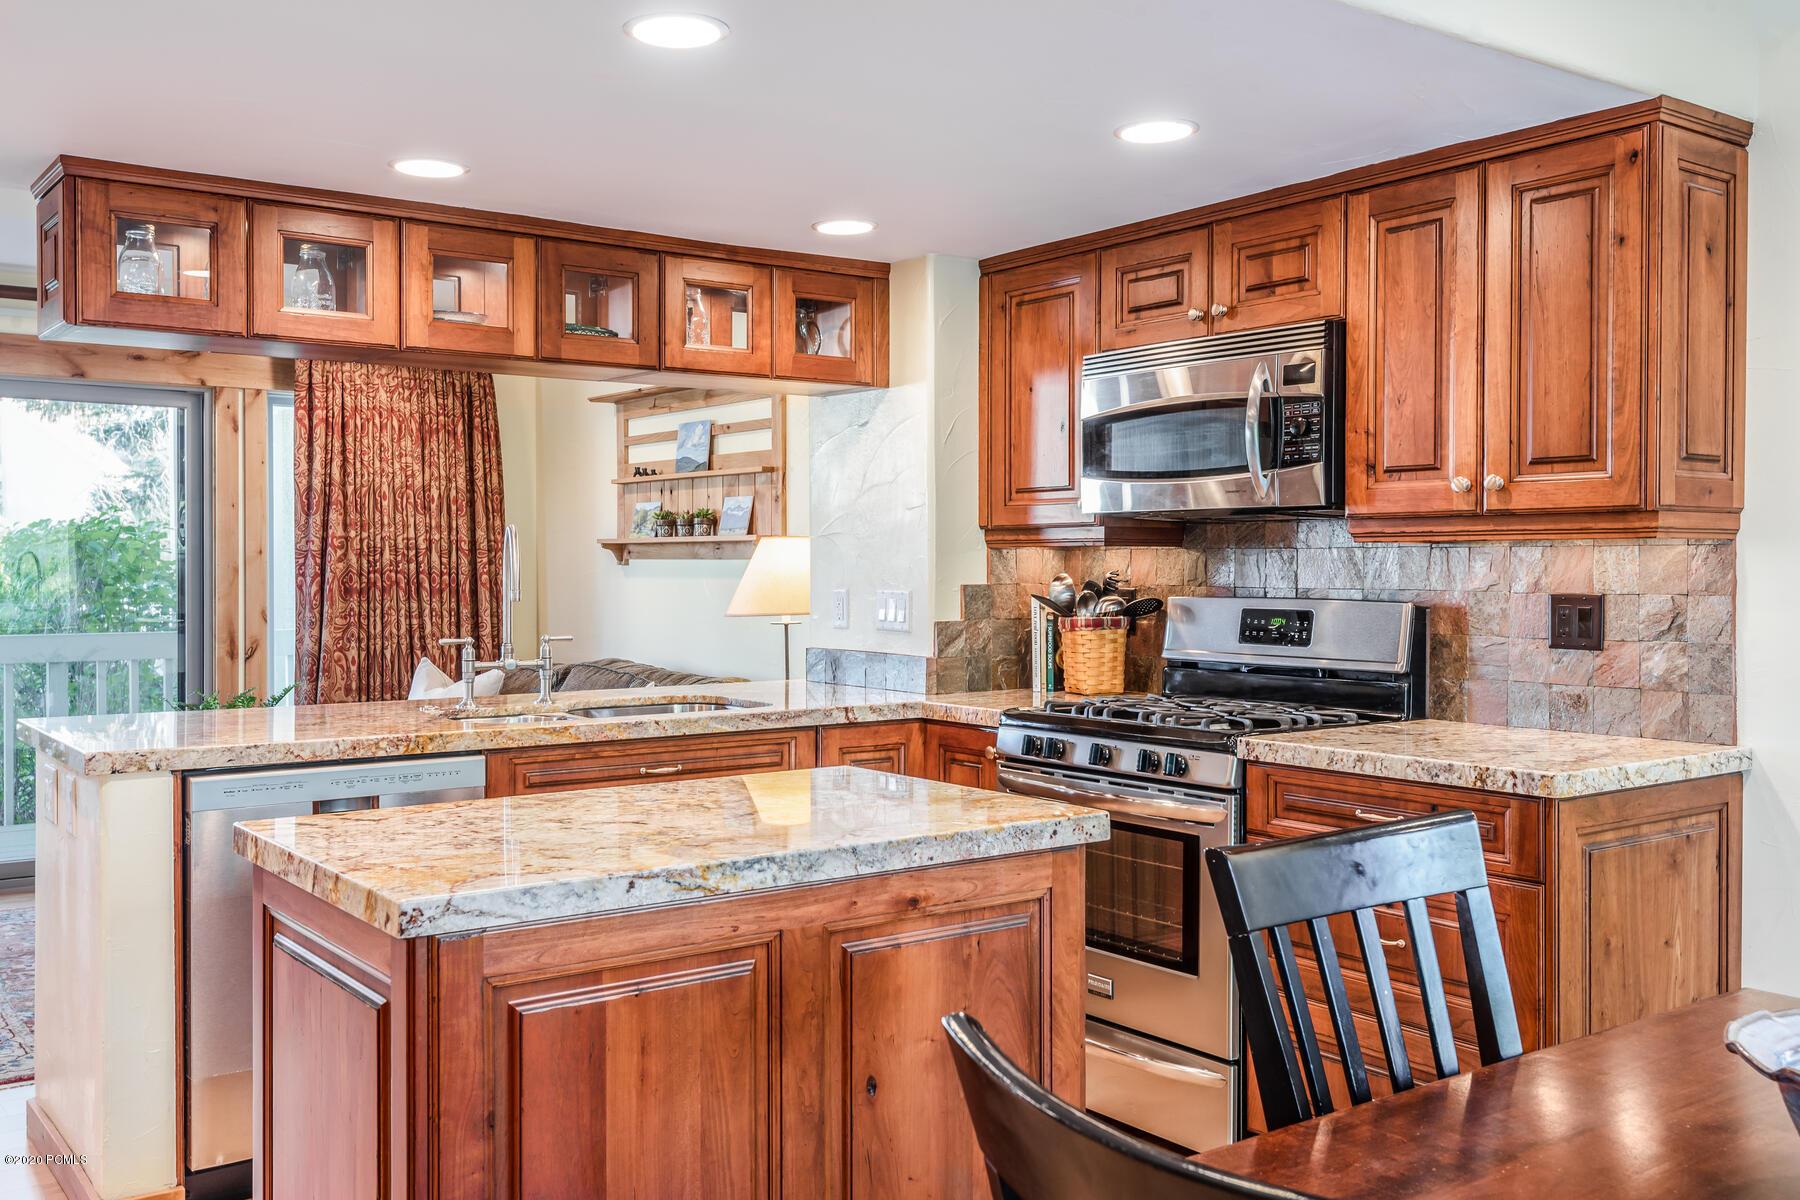 38 Racquet Club Drive, Park City, Utah 84060, 2 Bedrooms Bedrooms, ,3 BathroomsBathrooms,Condominium,For Sale,Racquet Club,12003773